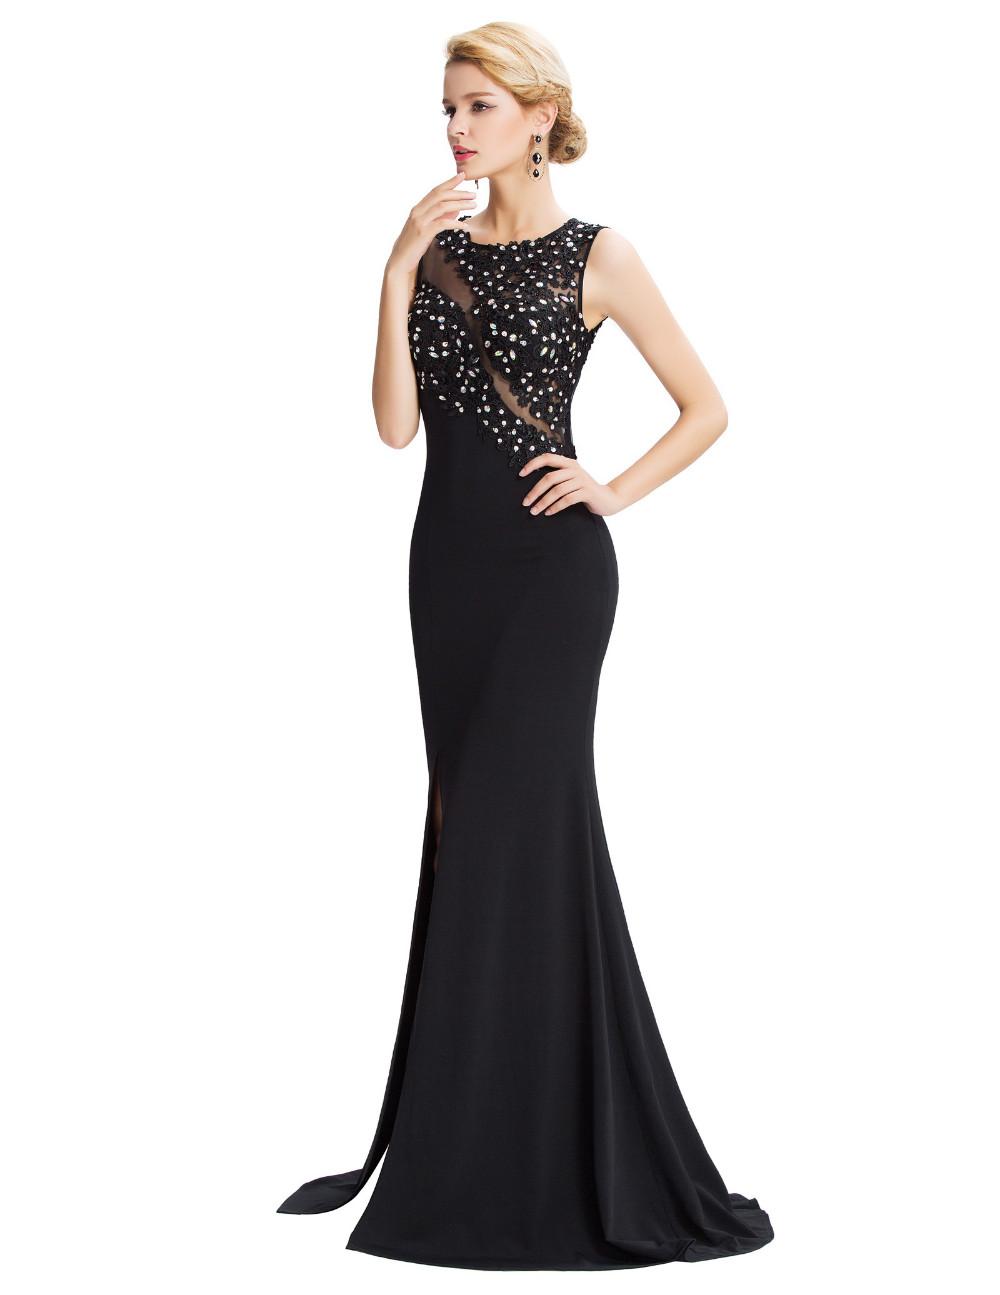 Grace Karin Sleeveless Black Mermaid Evening Dresses Floor Length Elegant Long Formal Dresses Robe De Soiree Sexy Evening Gowns 11